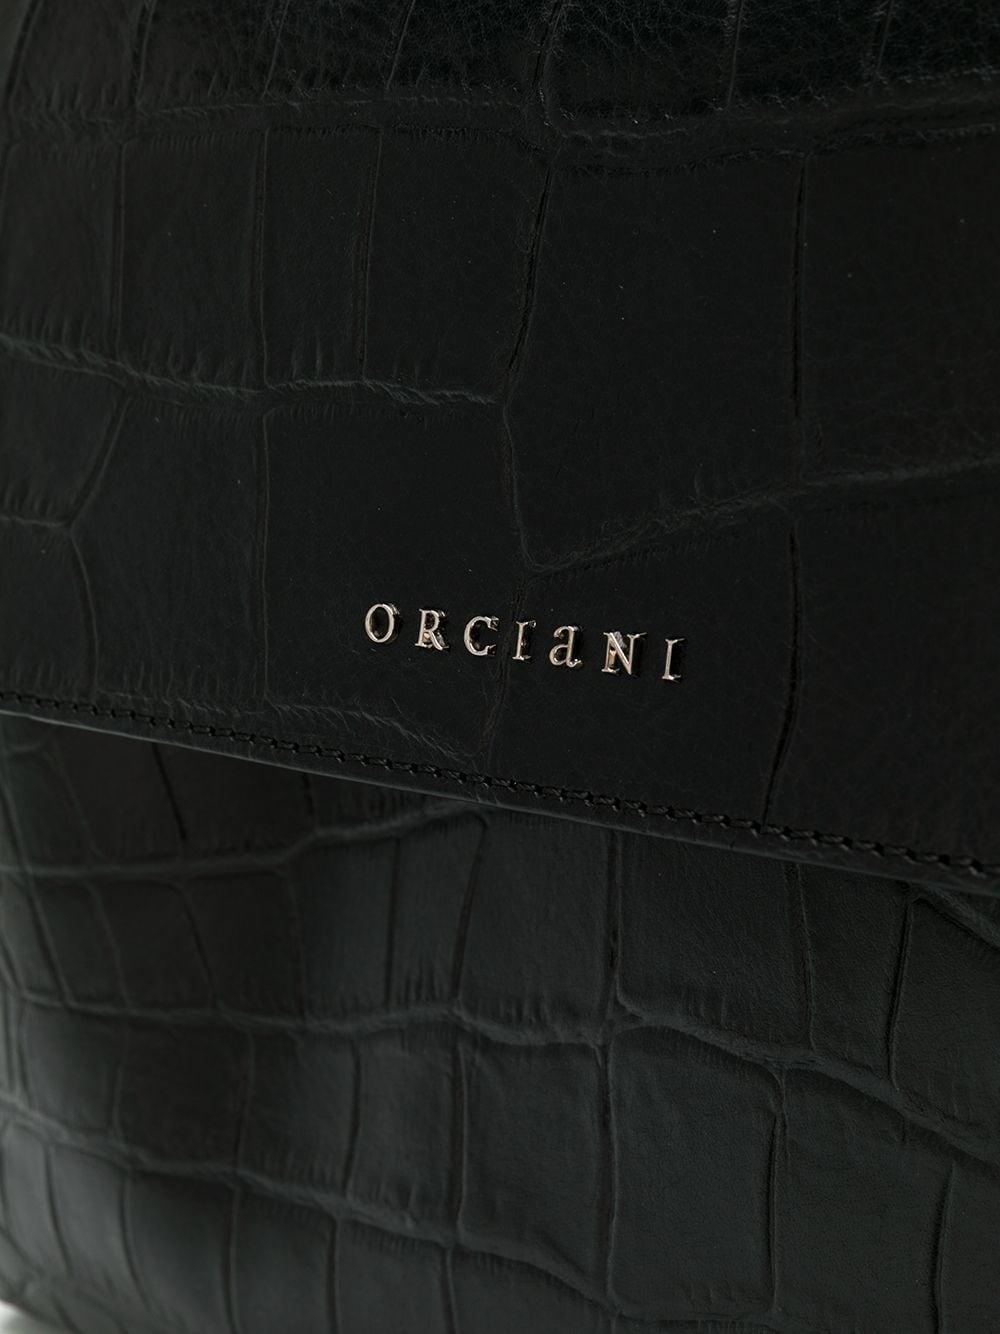 Sac à main Sveva Cuir Orciani en coloris Noir 9Xi7